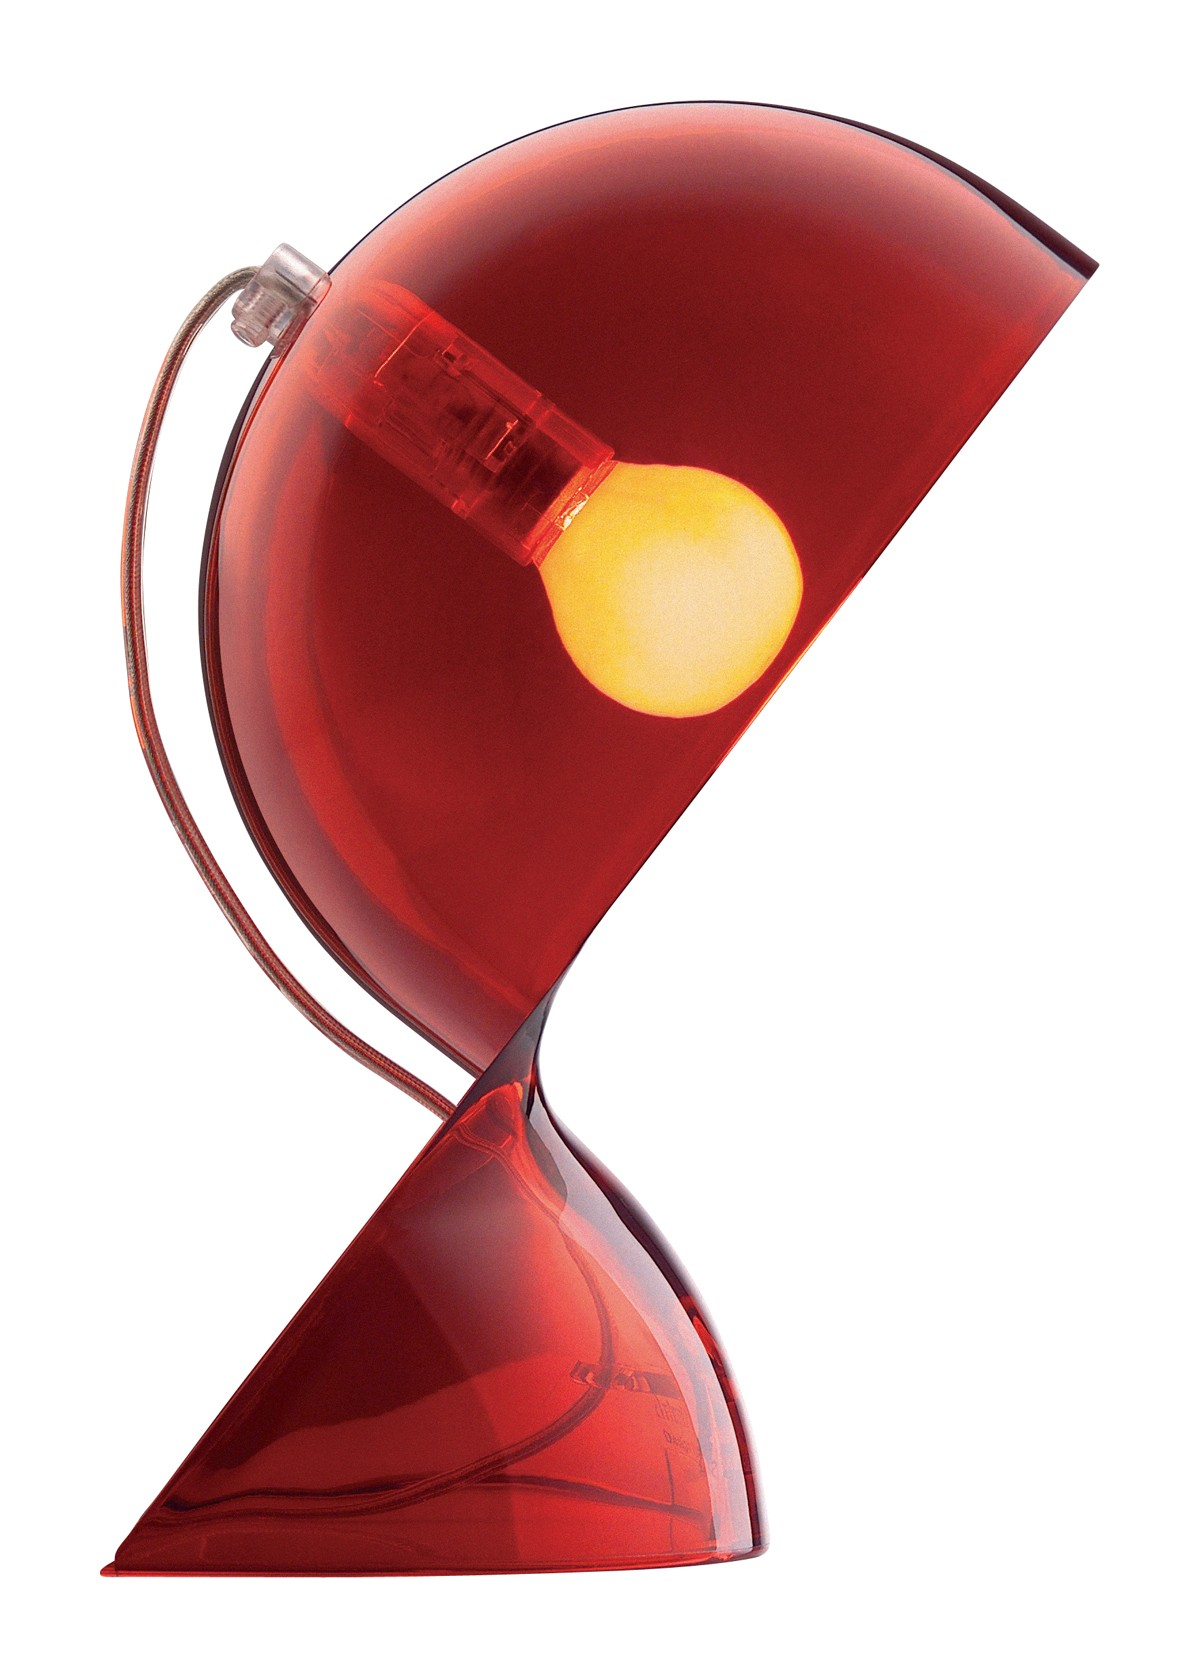 Lampe dalu art mide for Artemide lampe